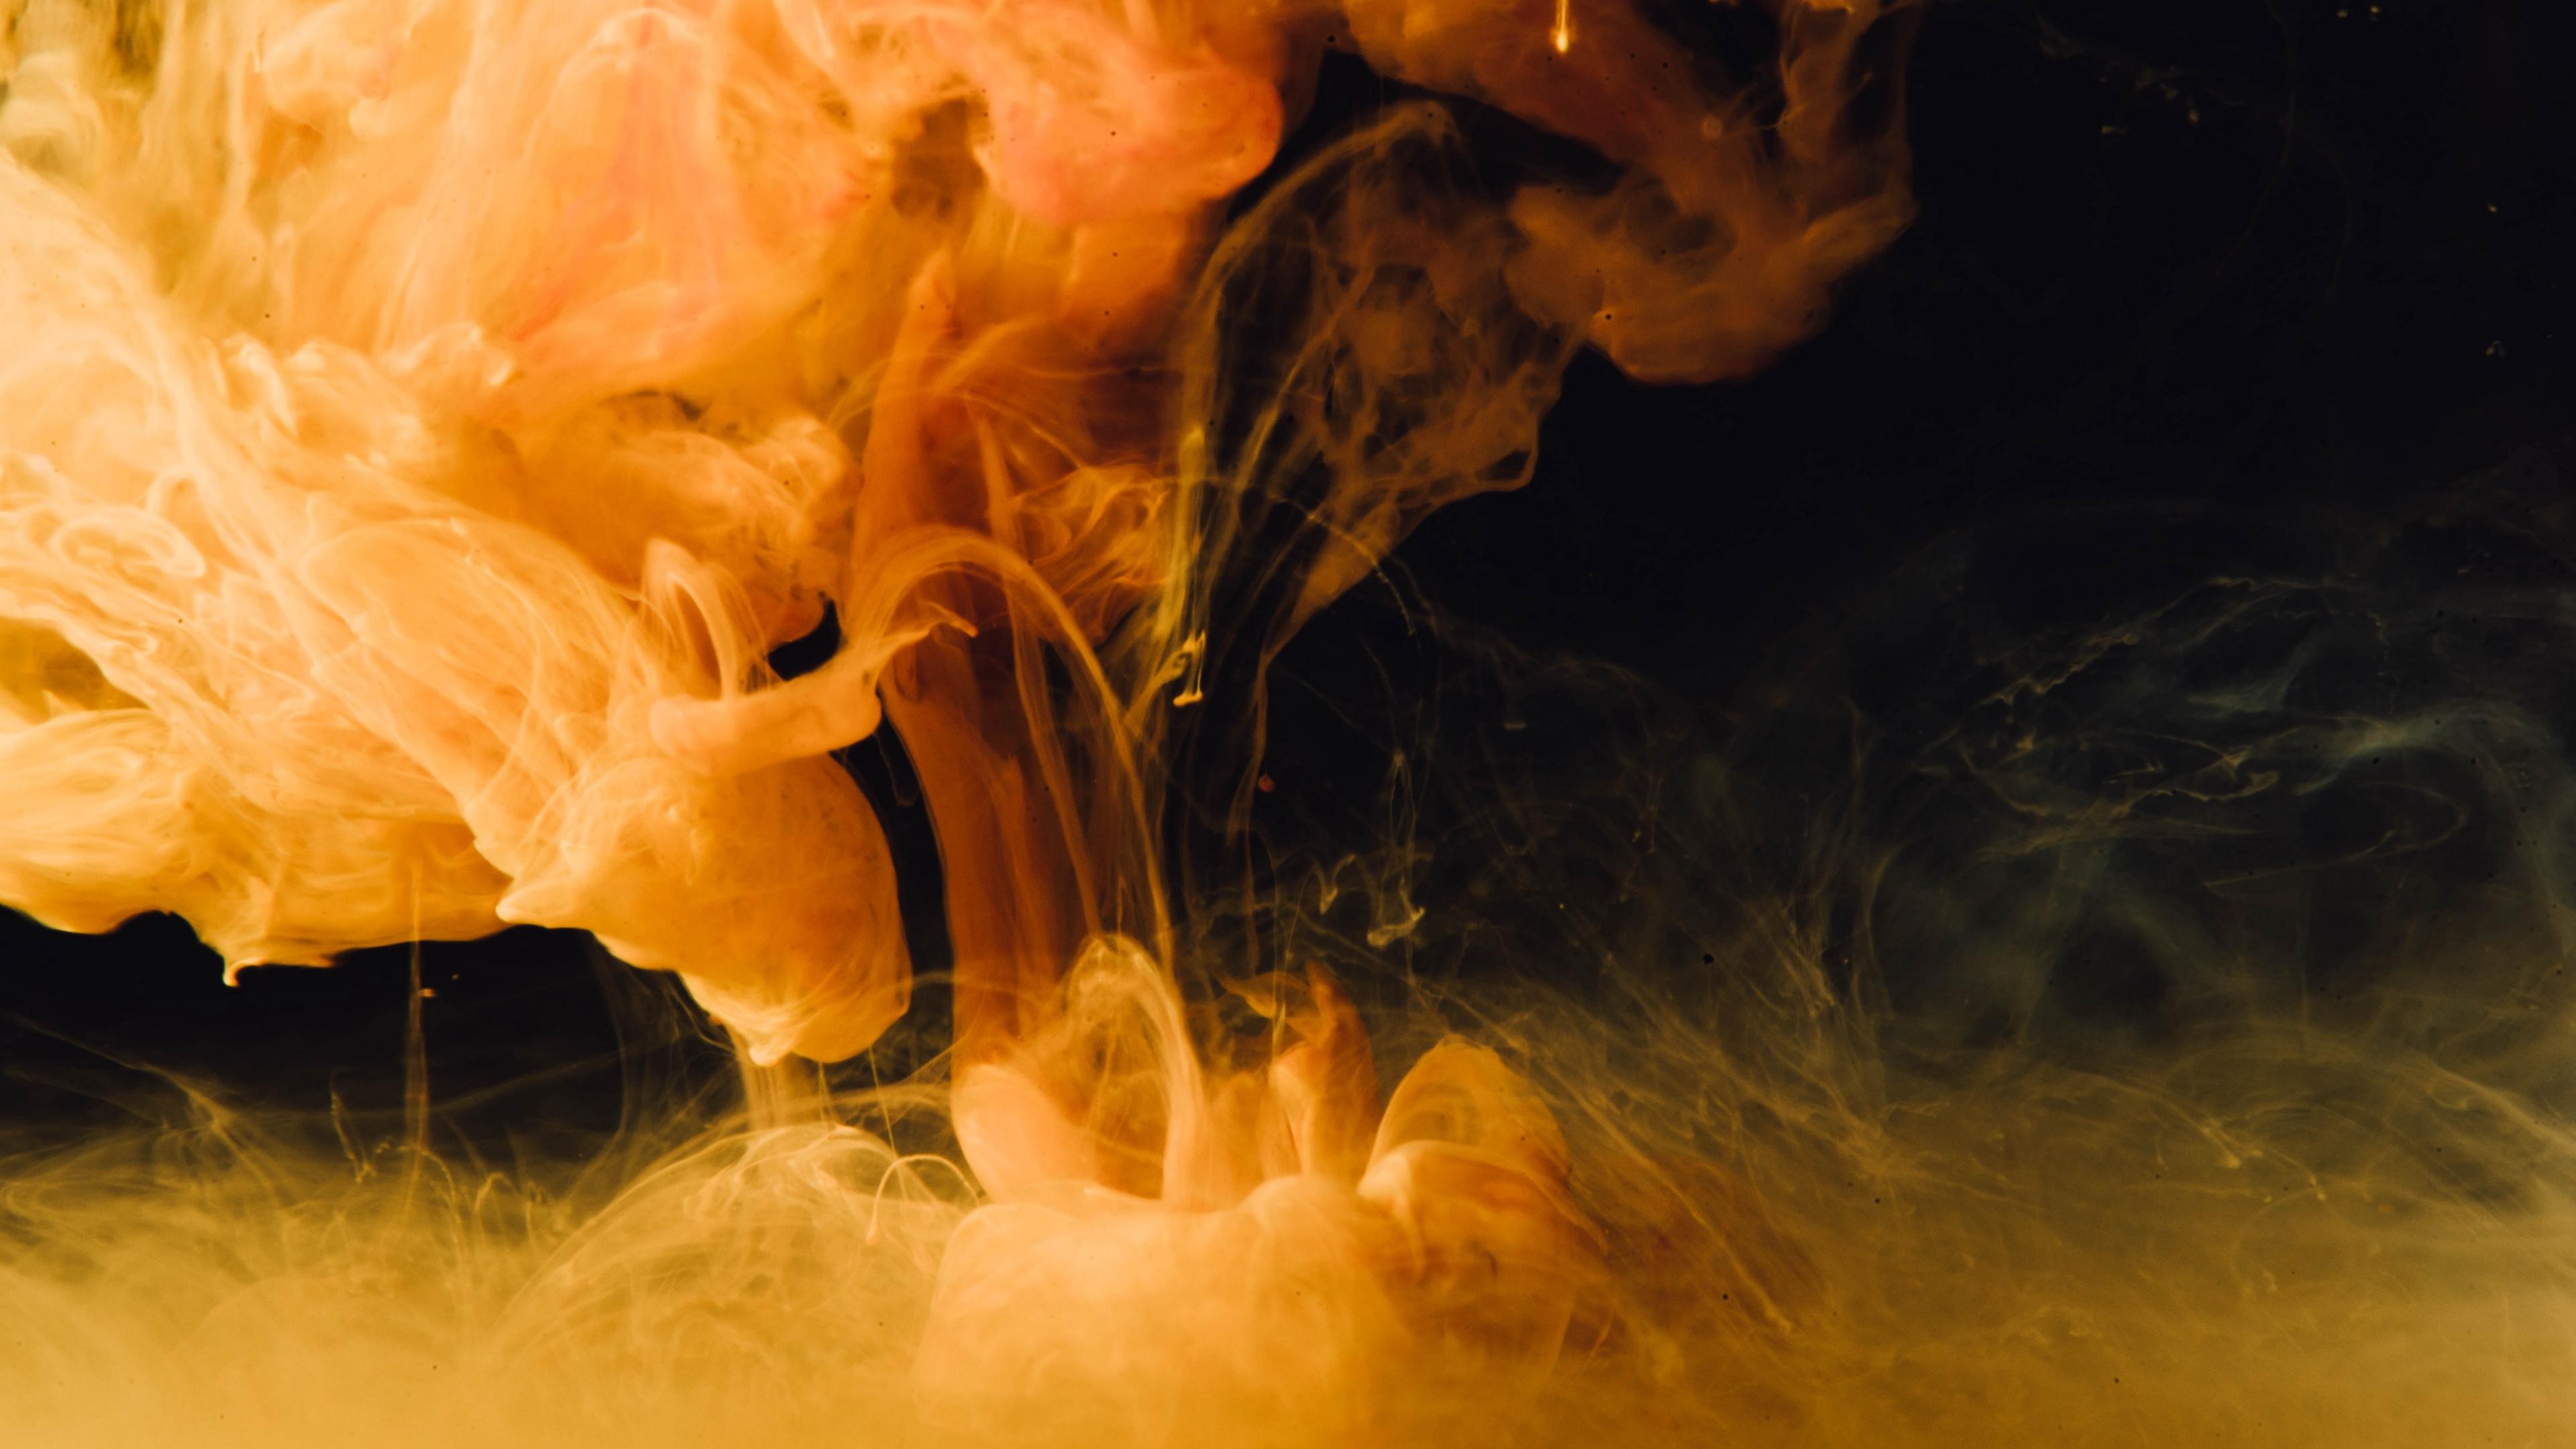 smoke shroud light 4k 1539369534 - smoke, shroud, light 4k - Smoke, shroud, Light